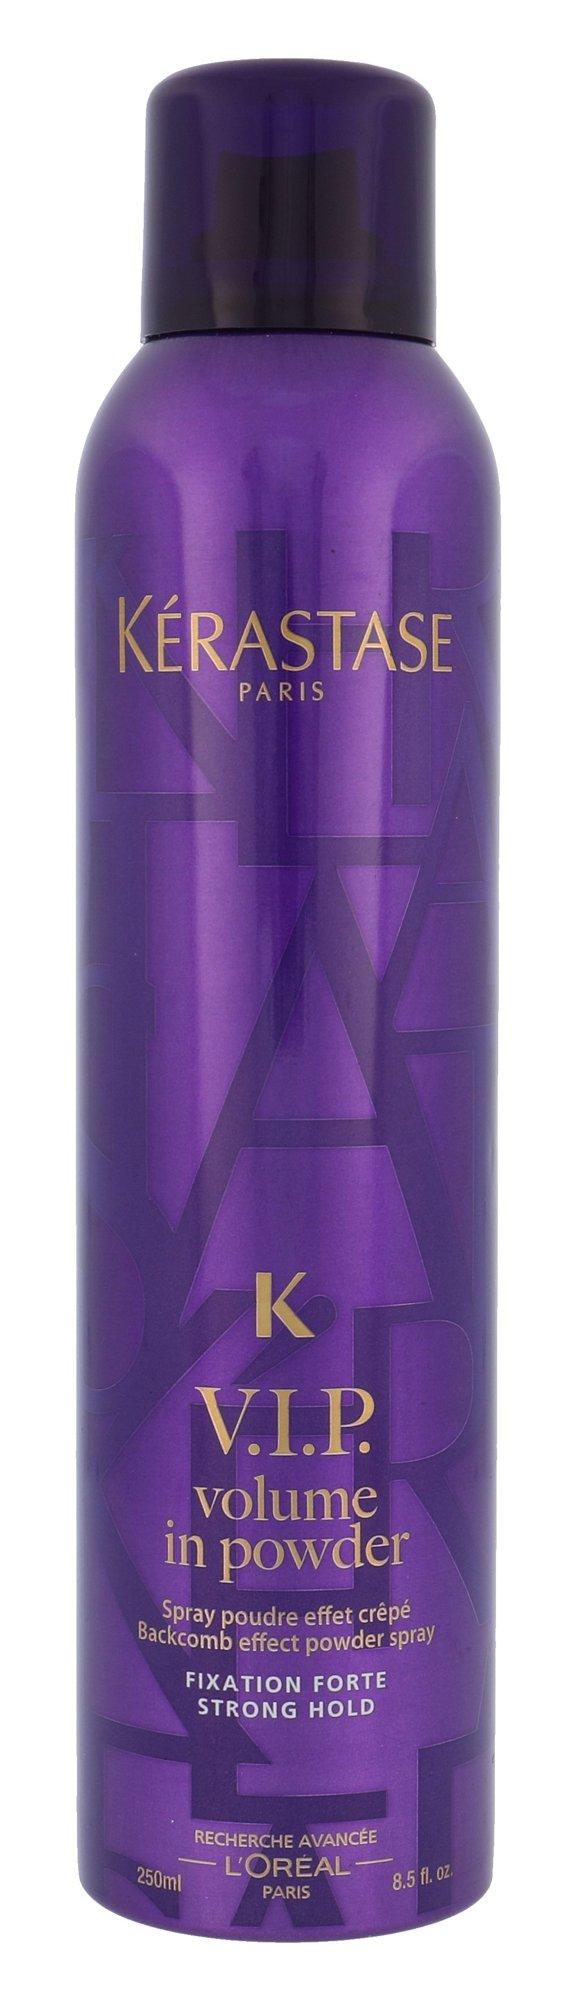 Kérastase VIP Cosmetic 250ml